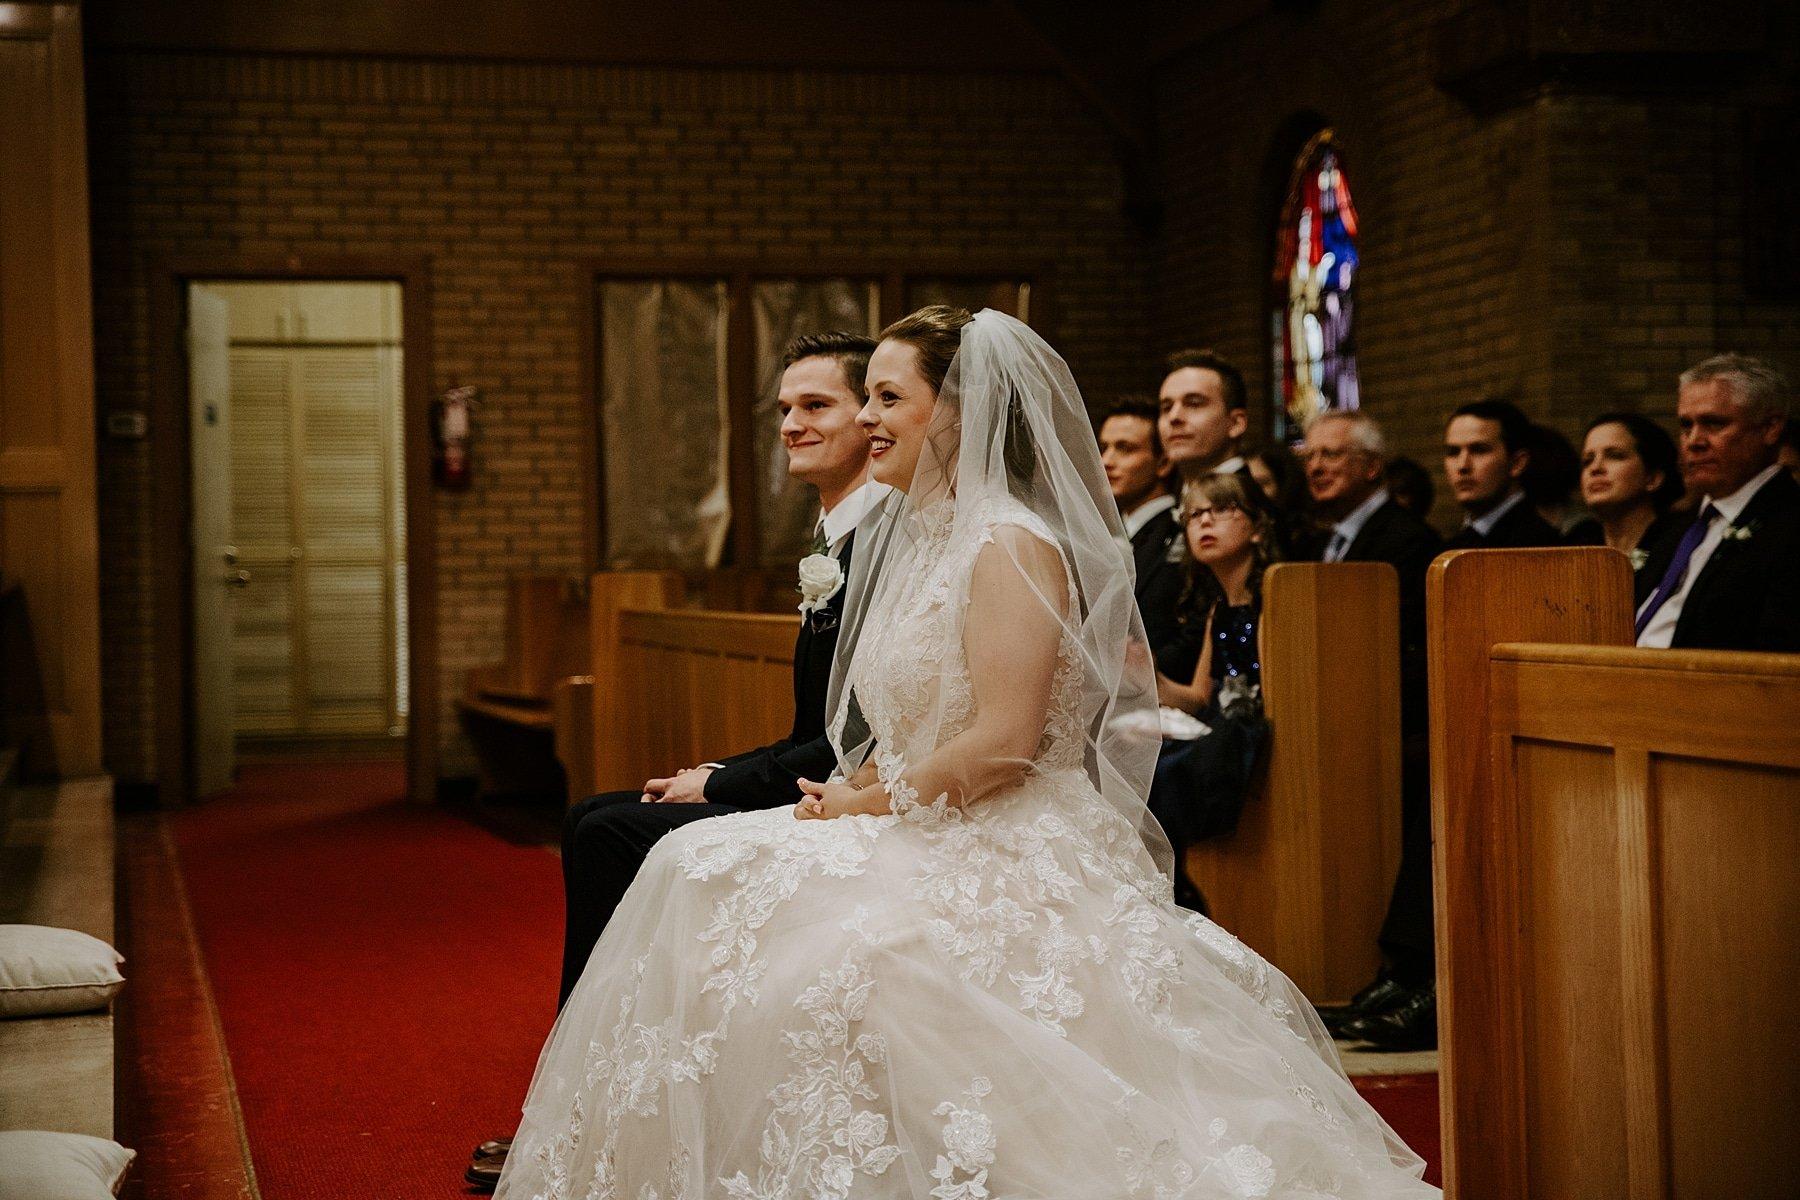 St Mary's Parish wedding in Banff